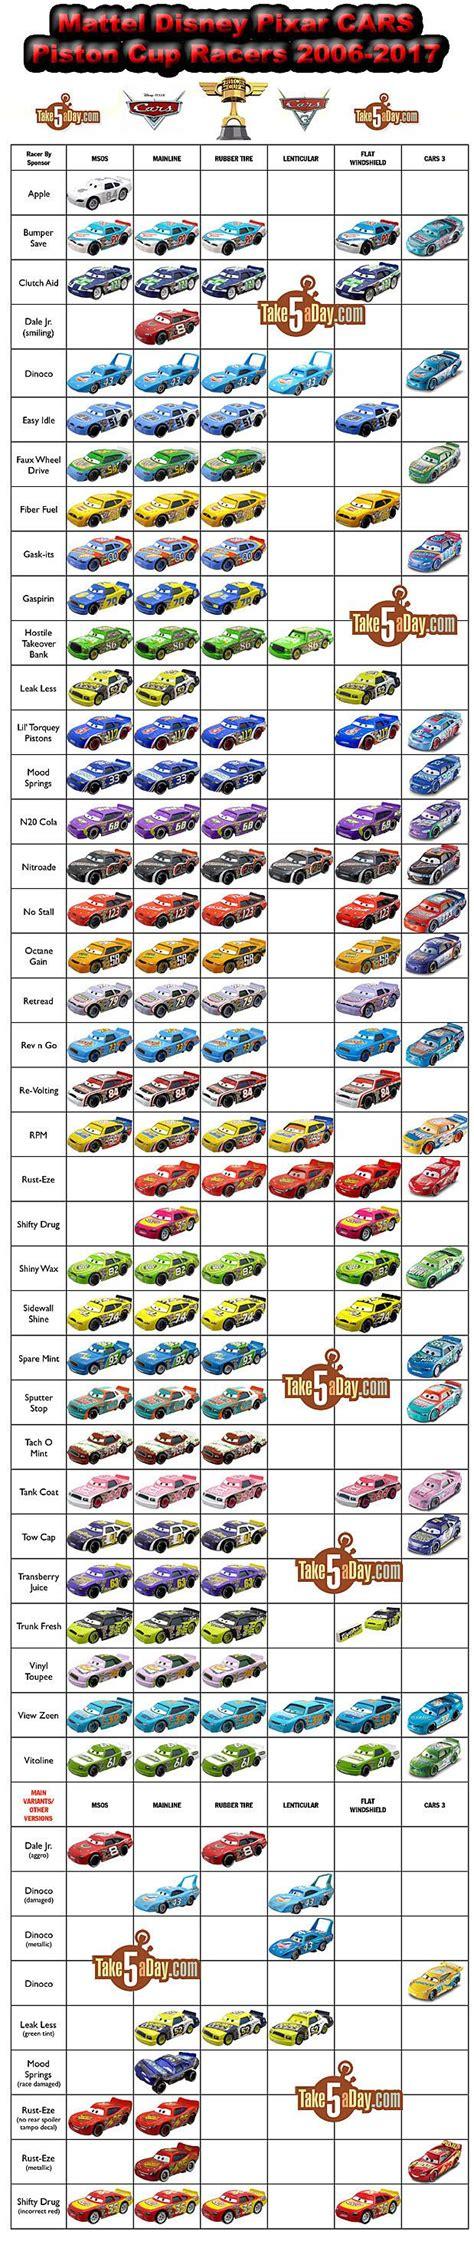 Cars Mini 3 Racers No 1 2 3 4 No 5 mattel disney pixar cars 1 to cars 3 piston cup racers